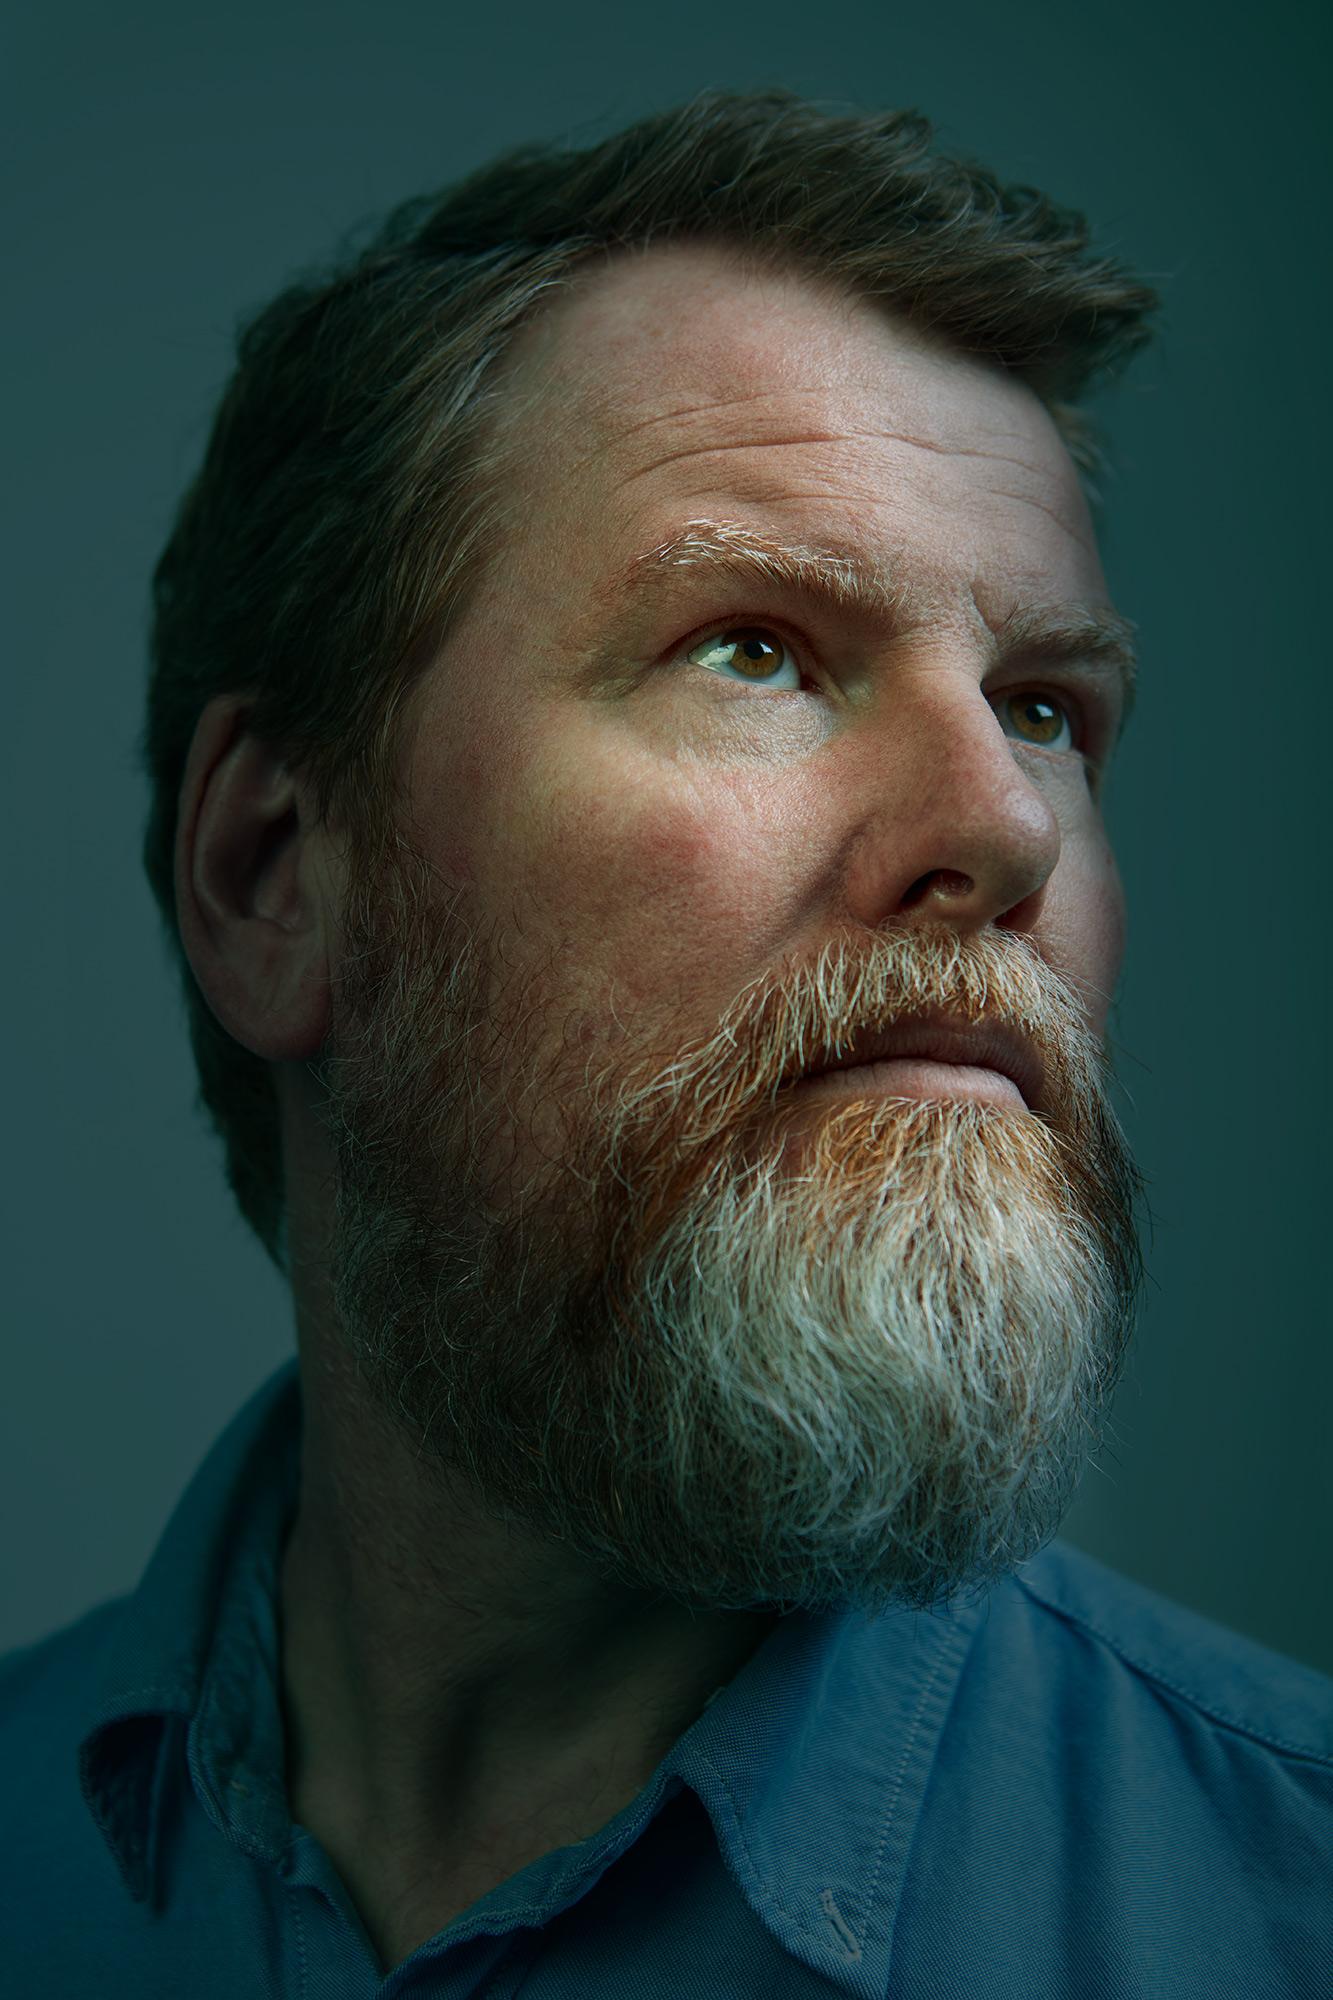 Stephen Peirce | Artist